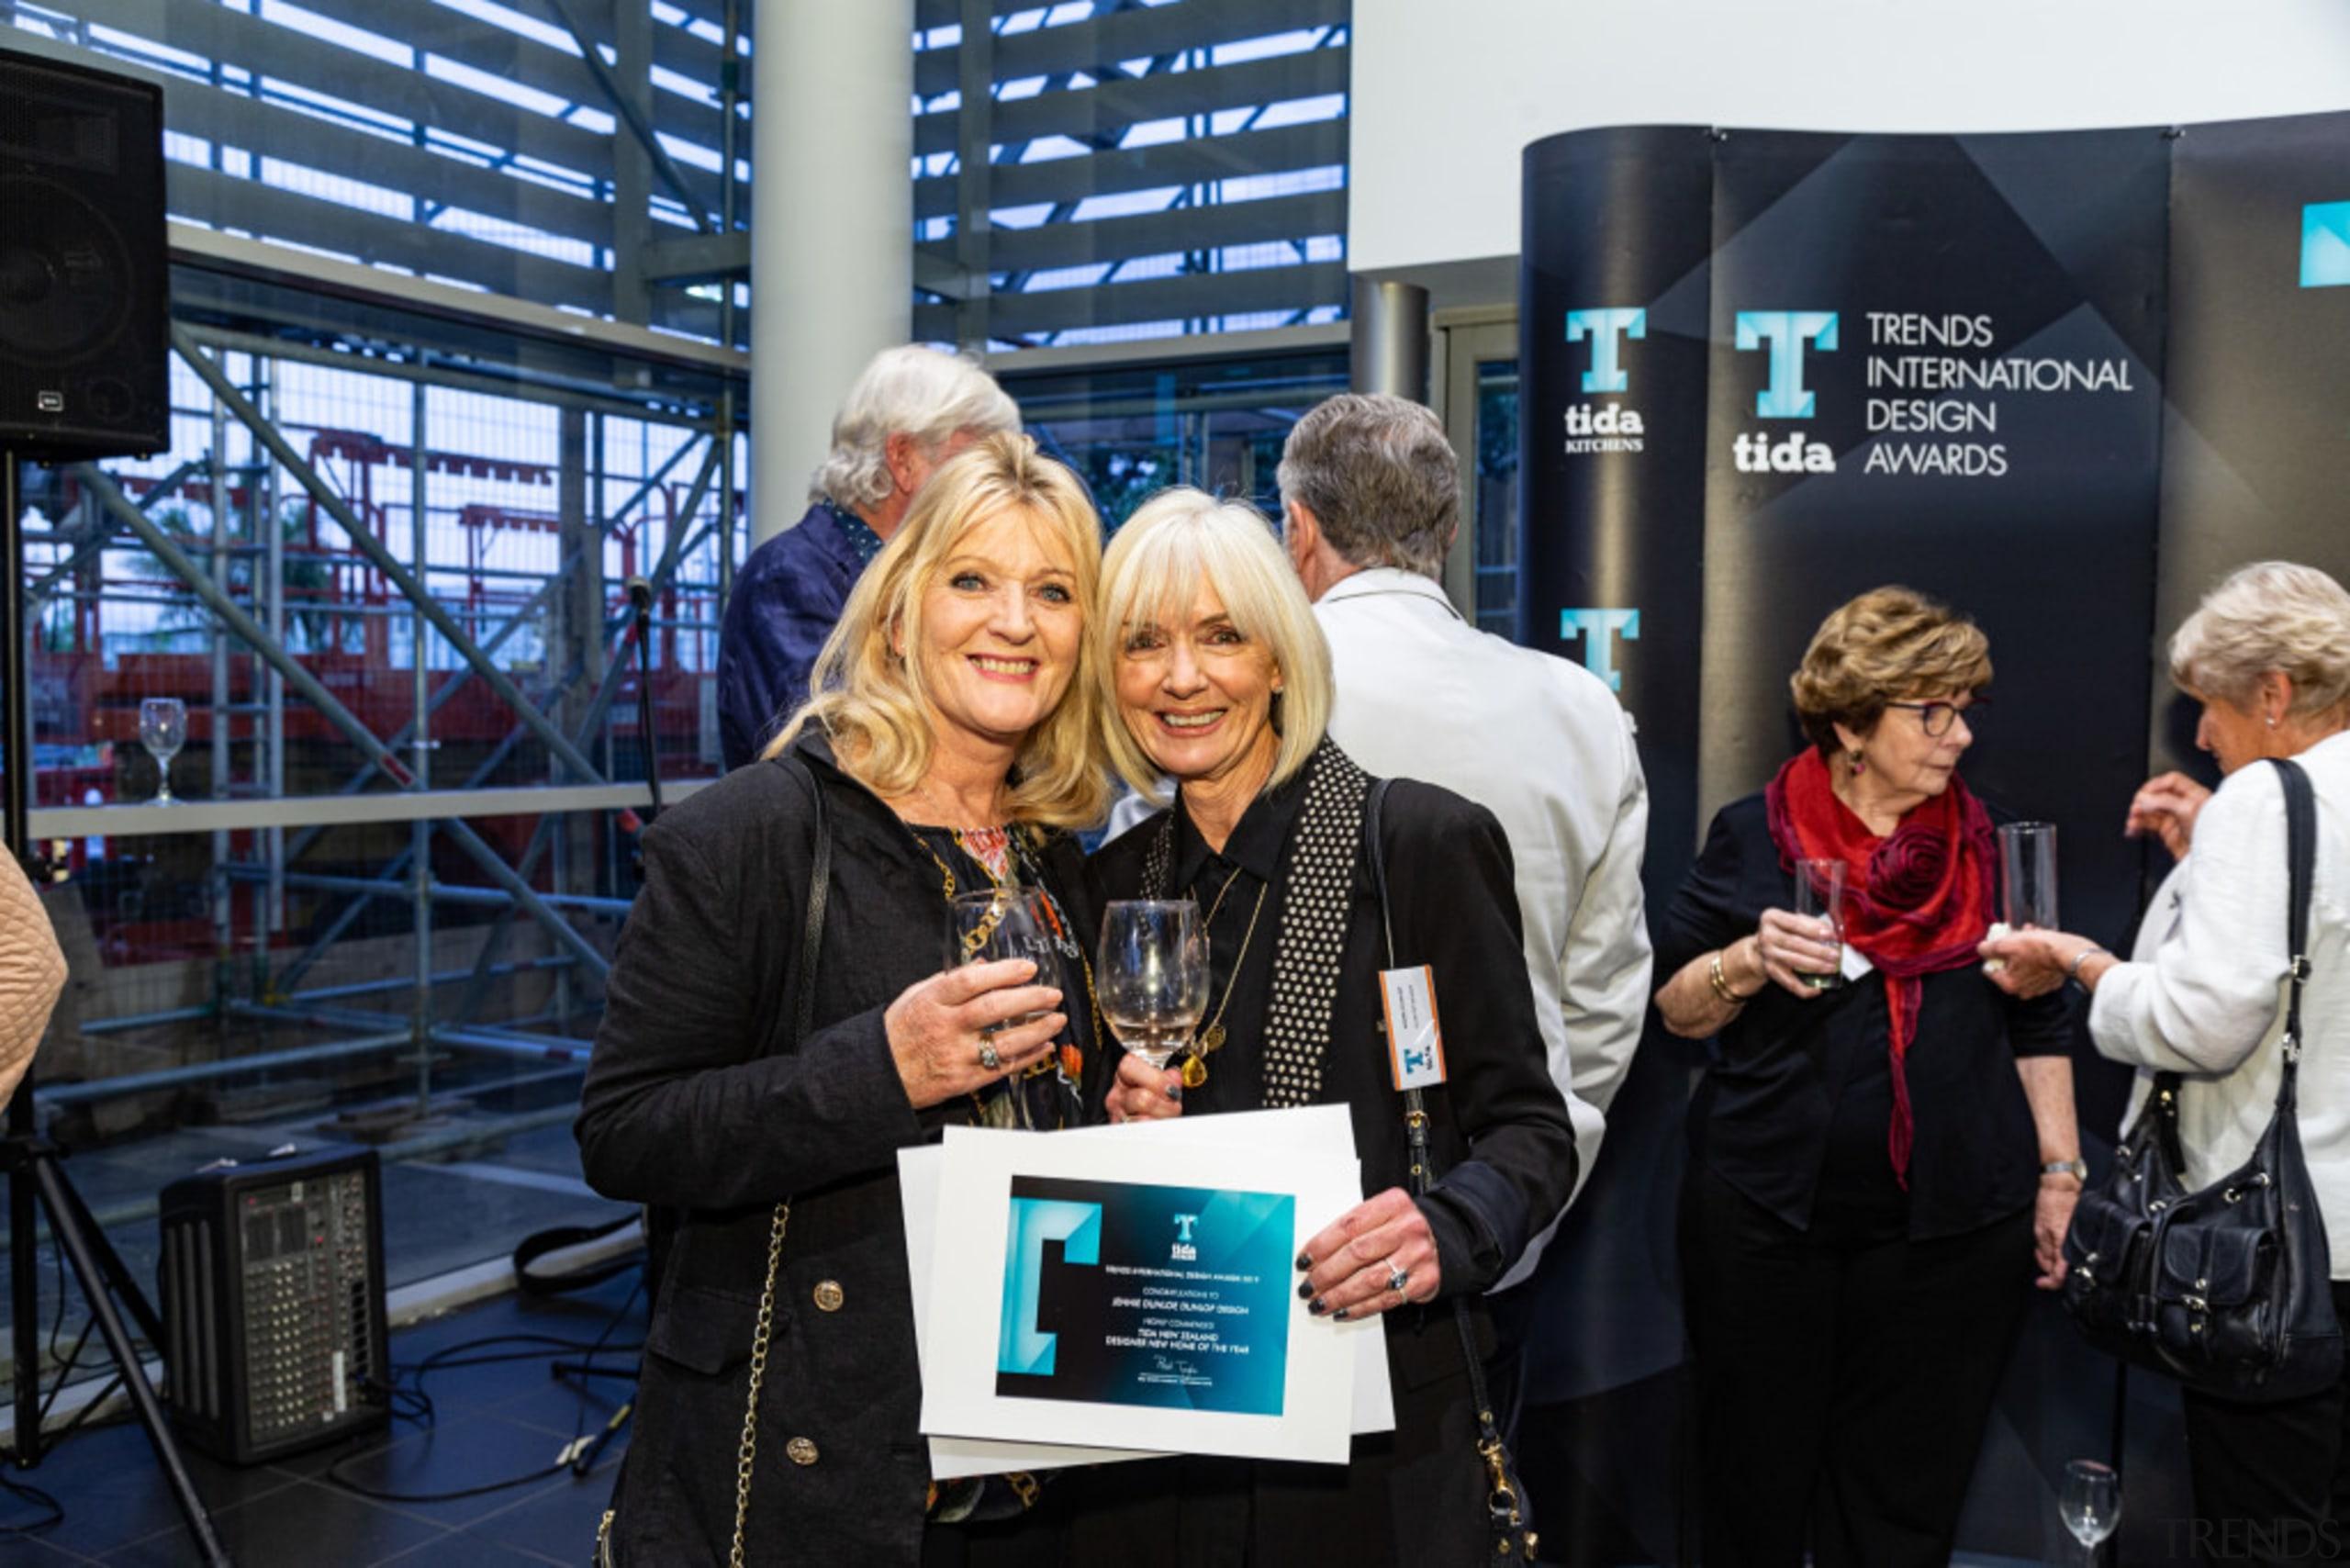 2019 TIDA New Zealand Homes presentation evening display device, event, job, product, technology, tourism, black